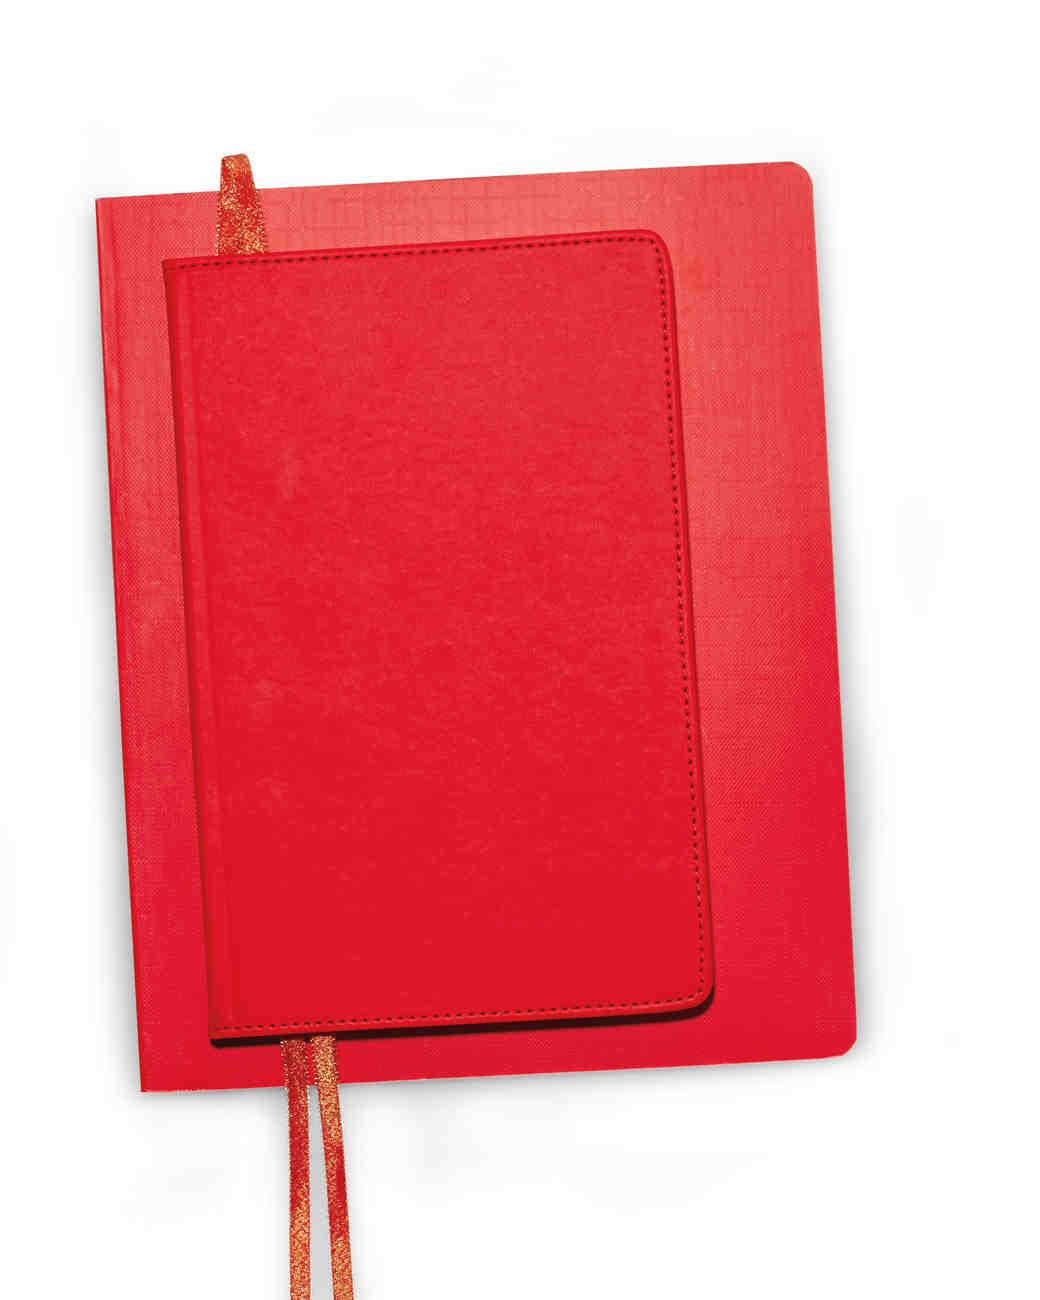 notebooks-030-mwd110687.jpg